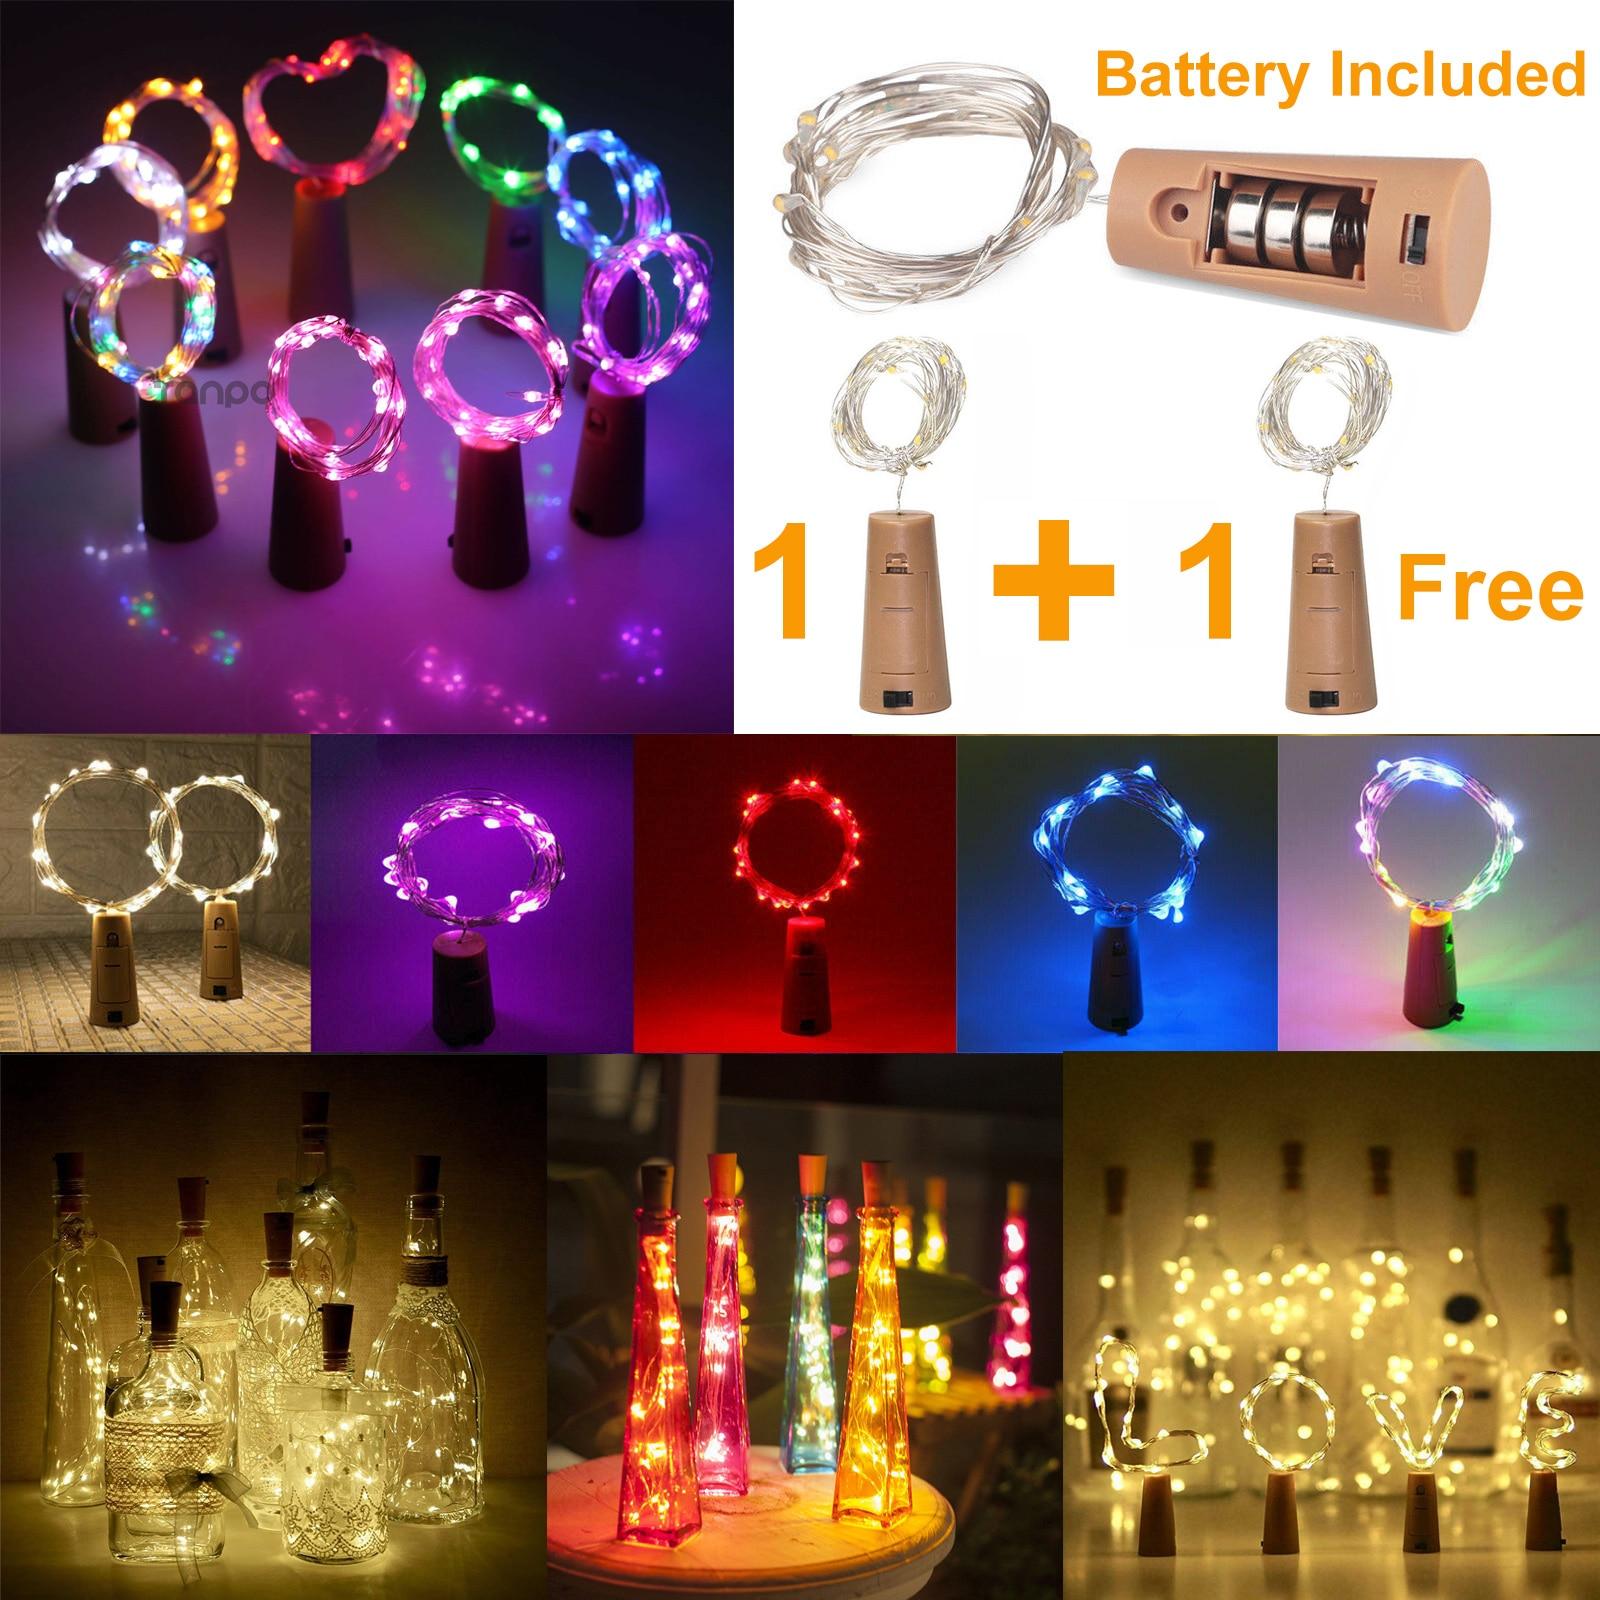 9 Colors LED Cork String Light 1M 2M 3M 10/20/30LEDs Fairy Lights Battery Powered Copper Wire For Xmas Wine Bottle Decor Lamp